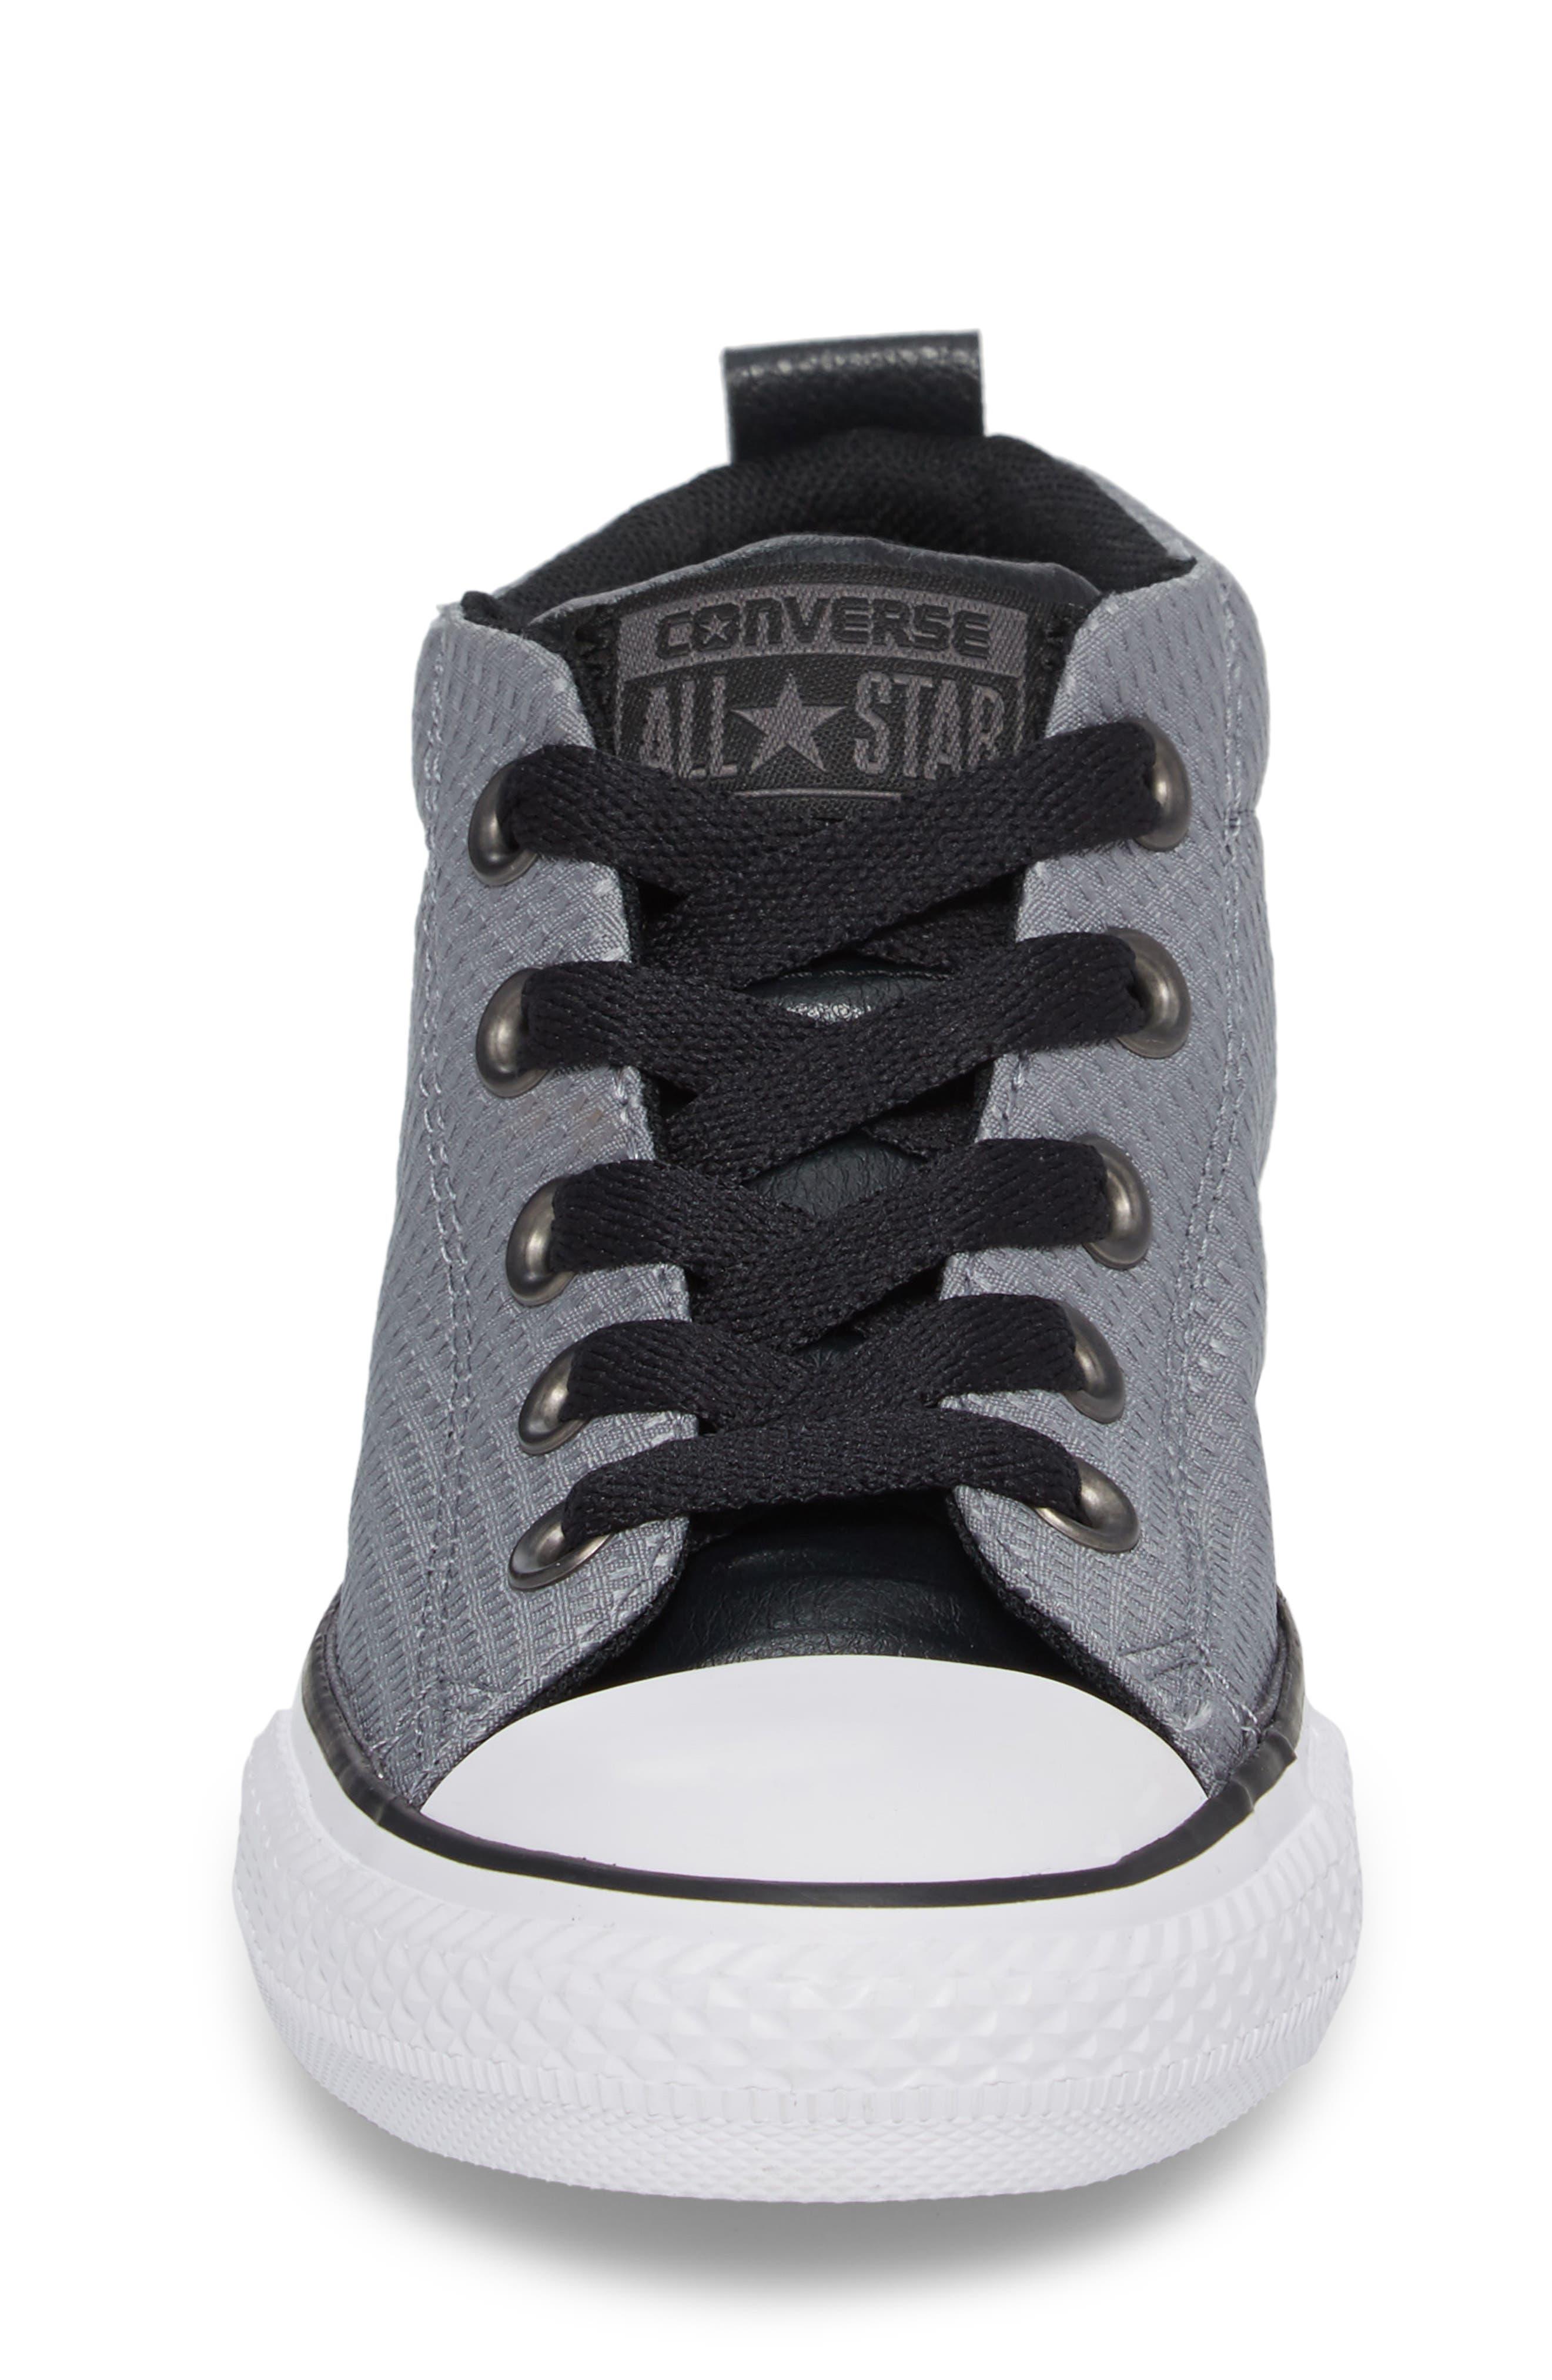 Alternate Image 4  - Converse Chuck Taylor® All Star® Street Mid Backpack Sneaker (Baby, Walker, Toddler, Little Kid & Big Kid)